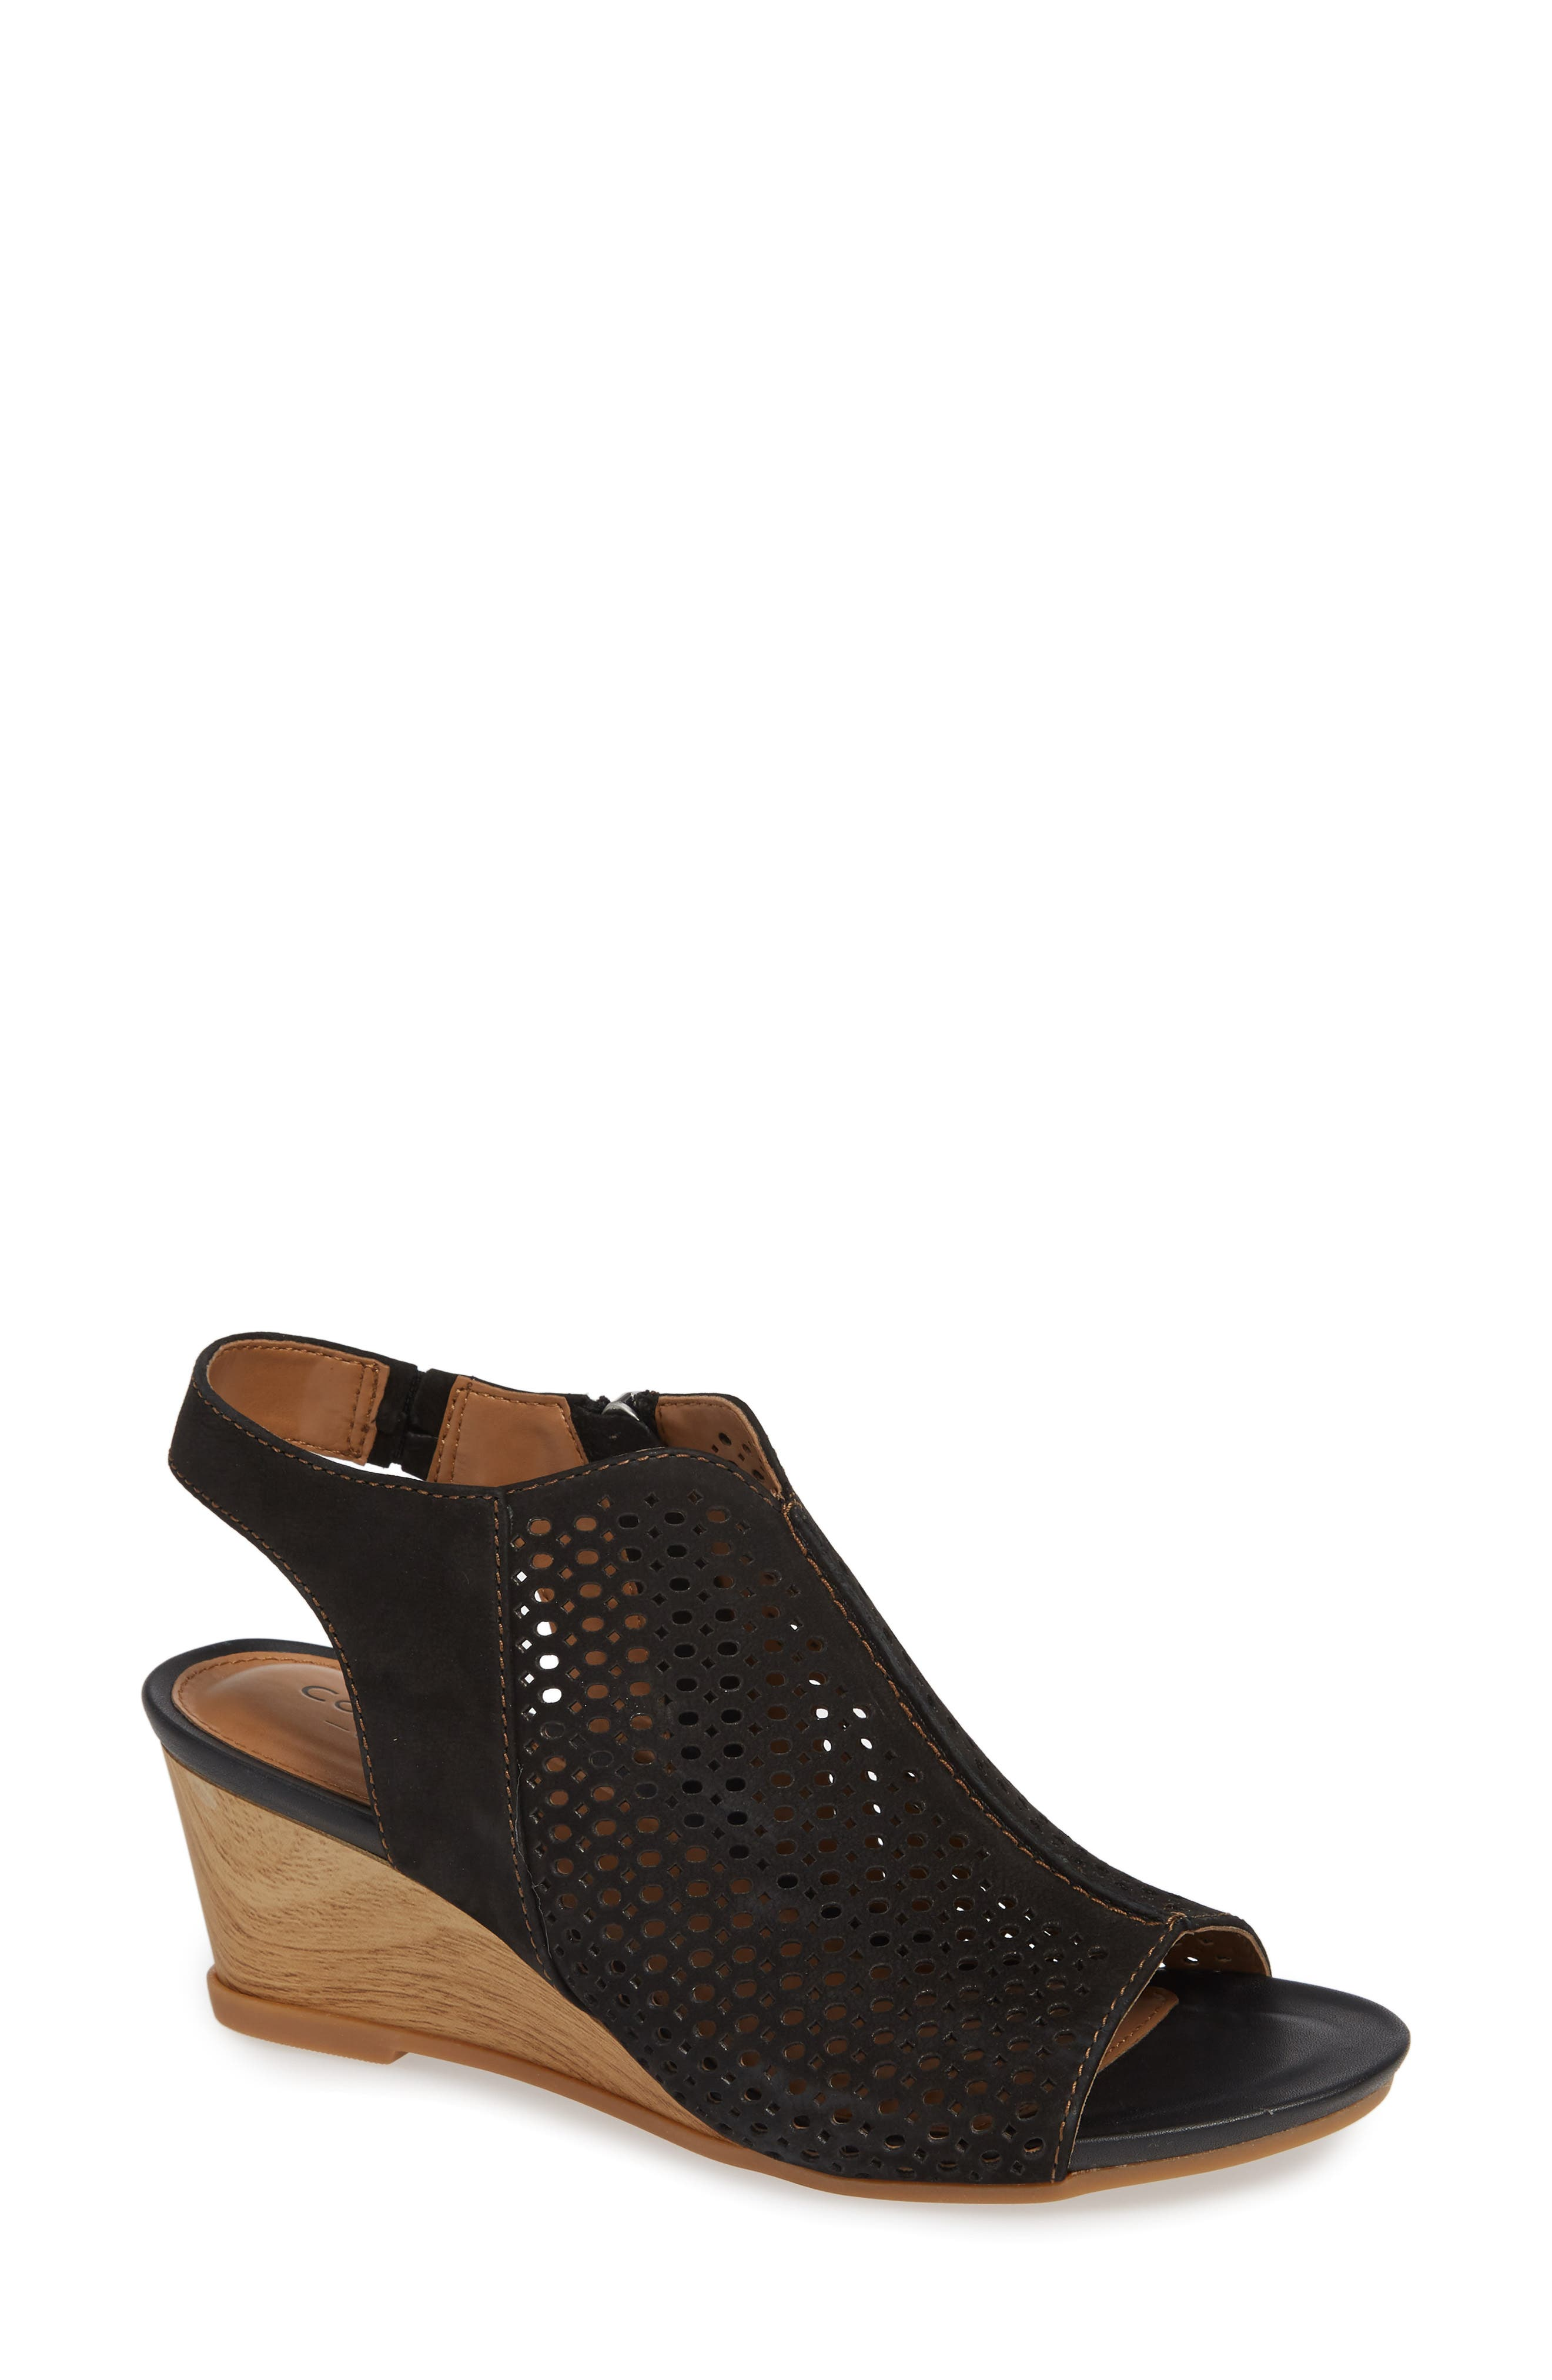 Skylyn Wedge Sandal, Main, color, BLACK NUBUCK LEATHER